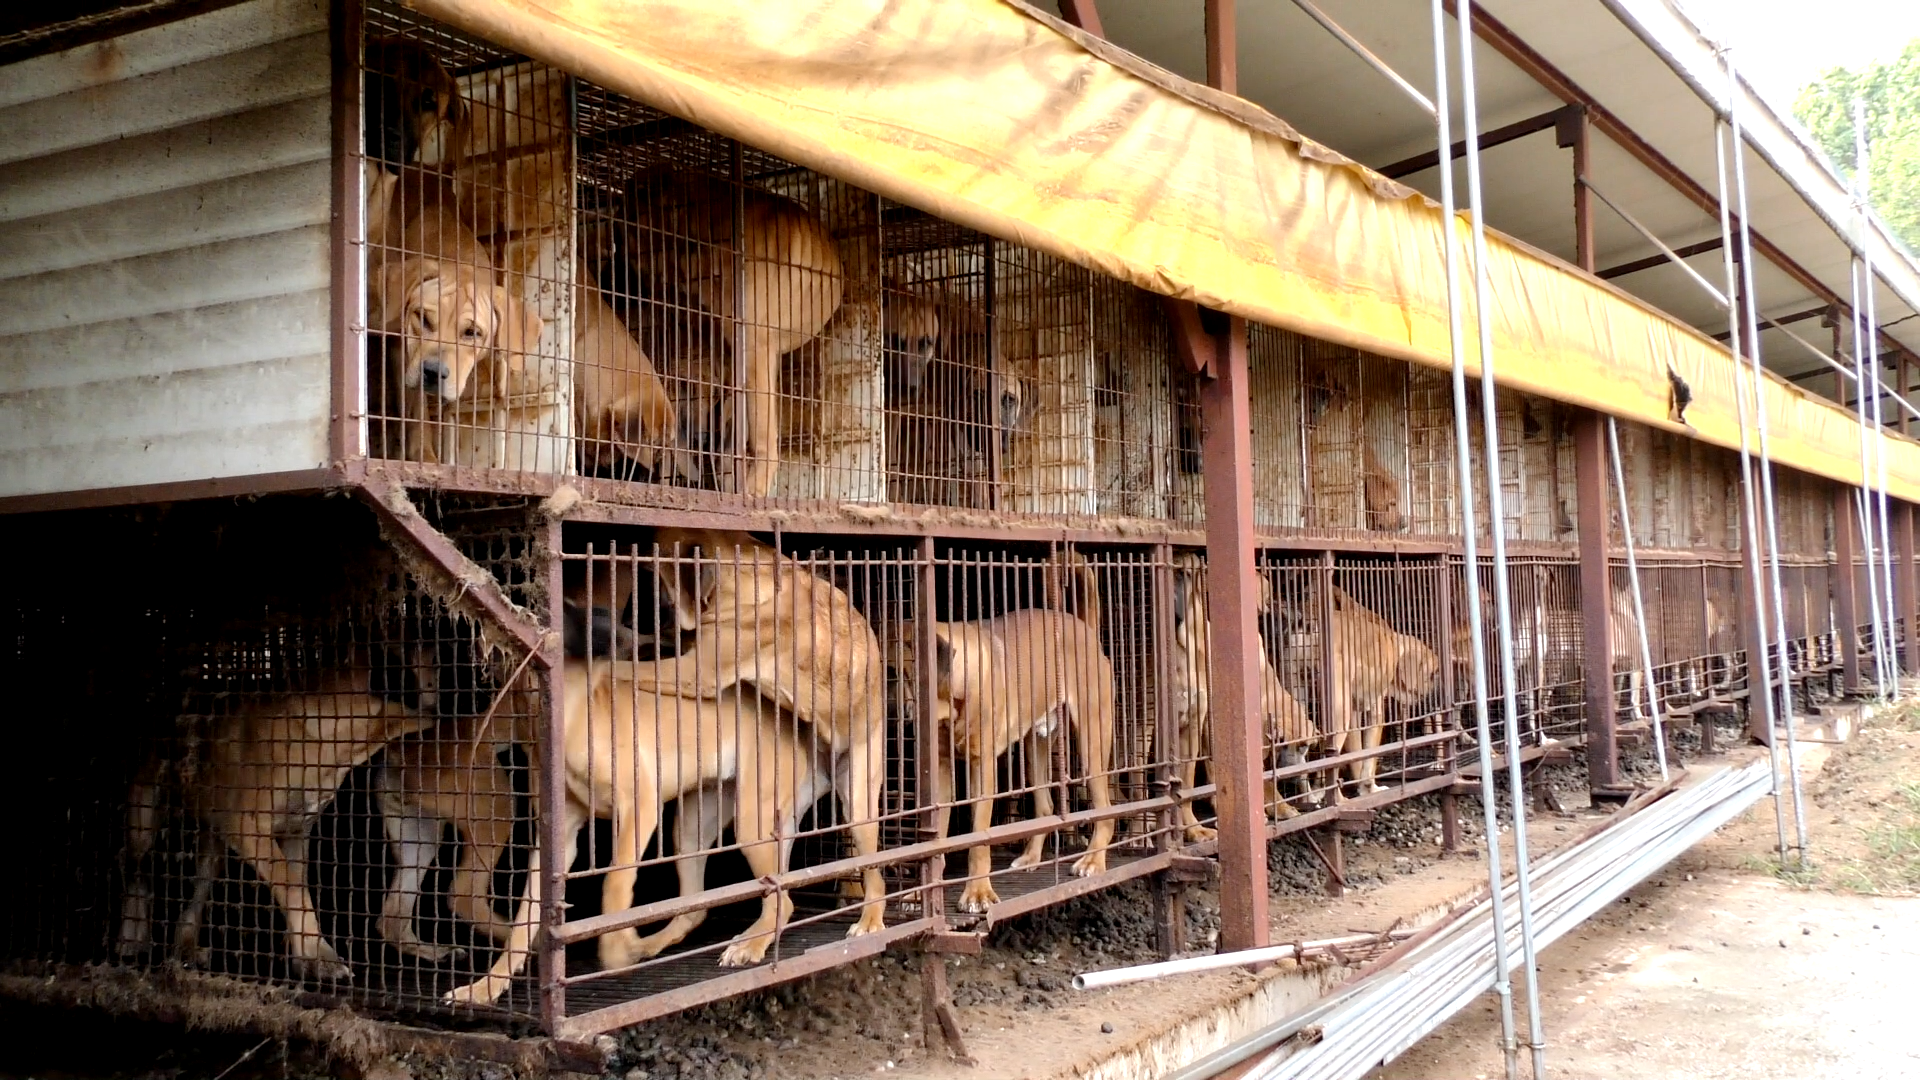 http://koreandogs.org/petitions/?utm_source=sendinblue&utm_campaign=Milk_and_Shake_waiting_for_home__New_Calls_for_Action&utm_medium=email